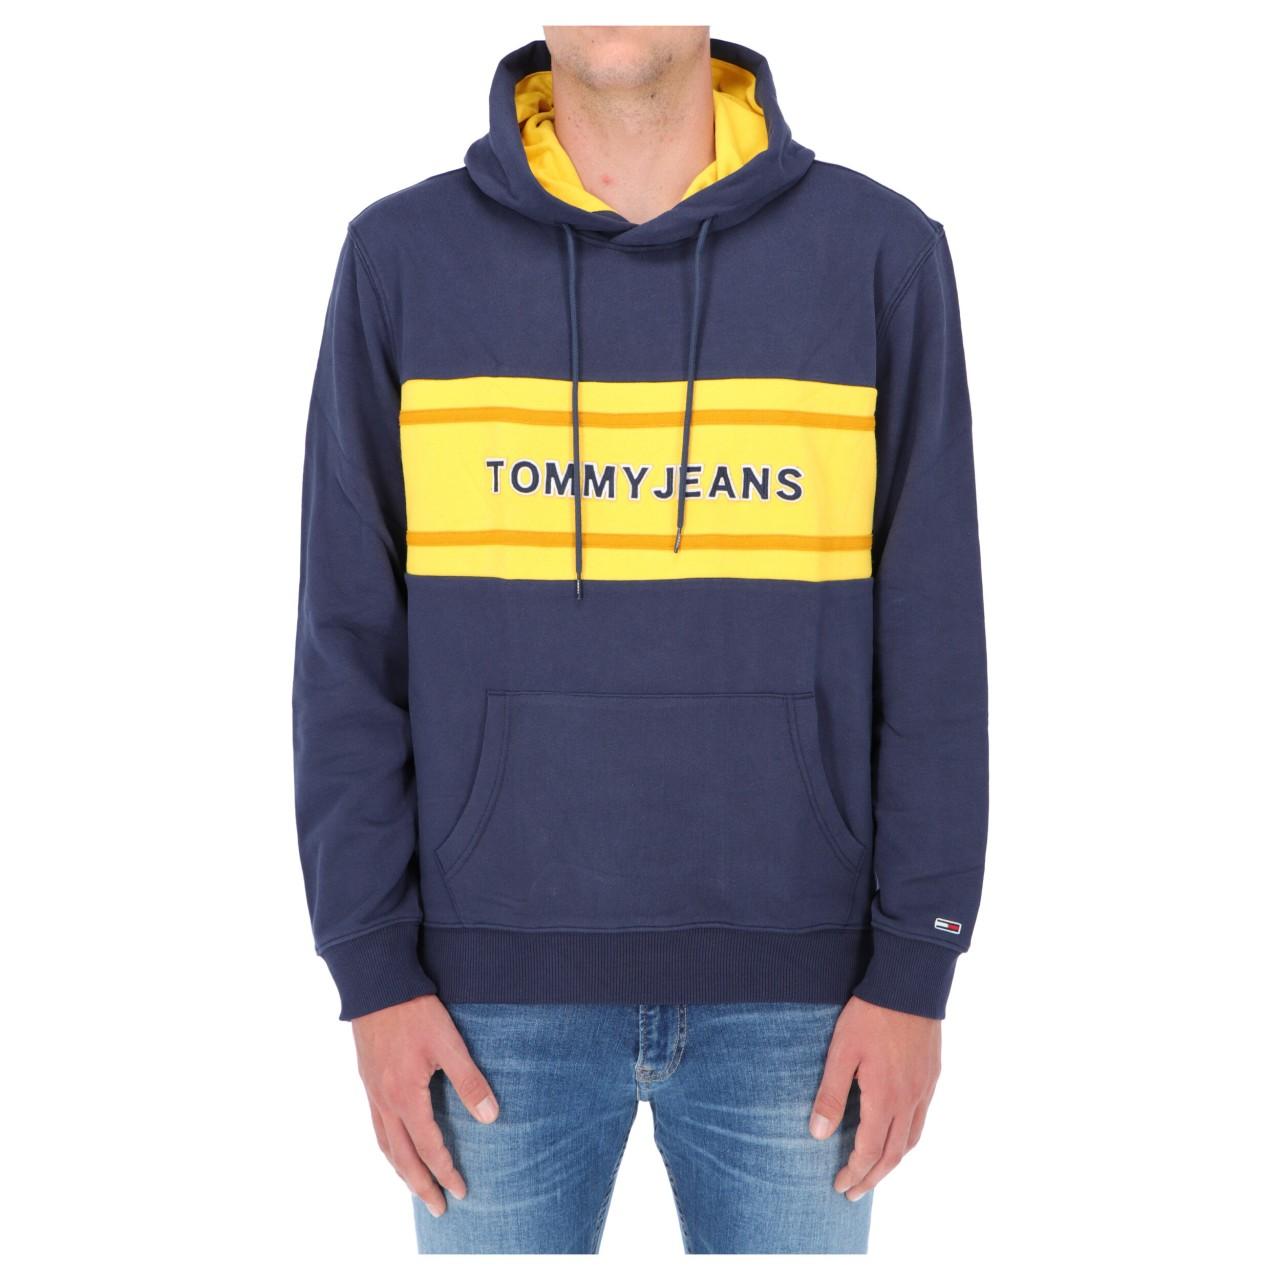 Tommy hilfiger Uomo Felpa Tommy Hilfiger Jeans Uomo Pieced Bend Logo 09651Q